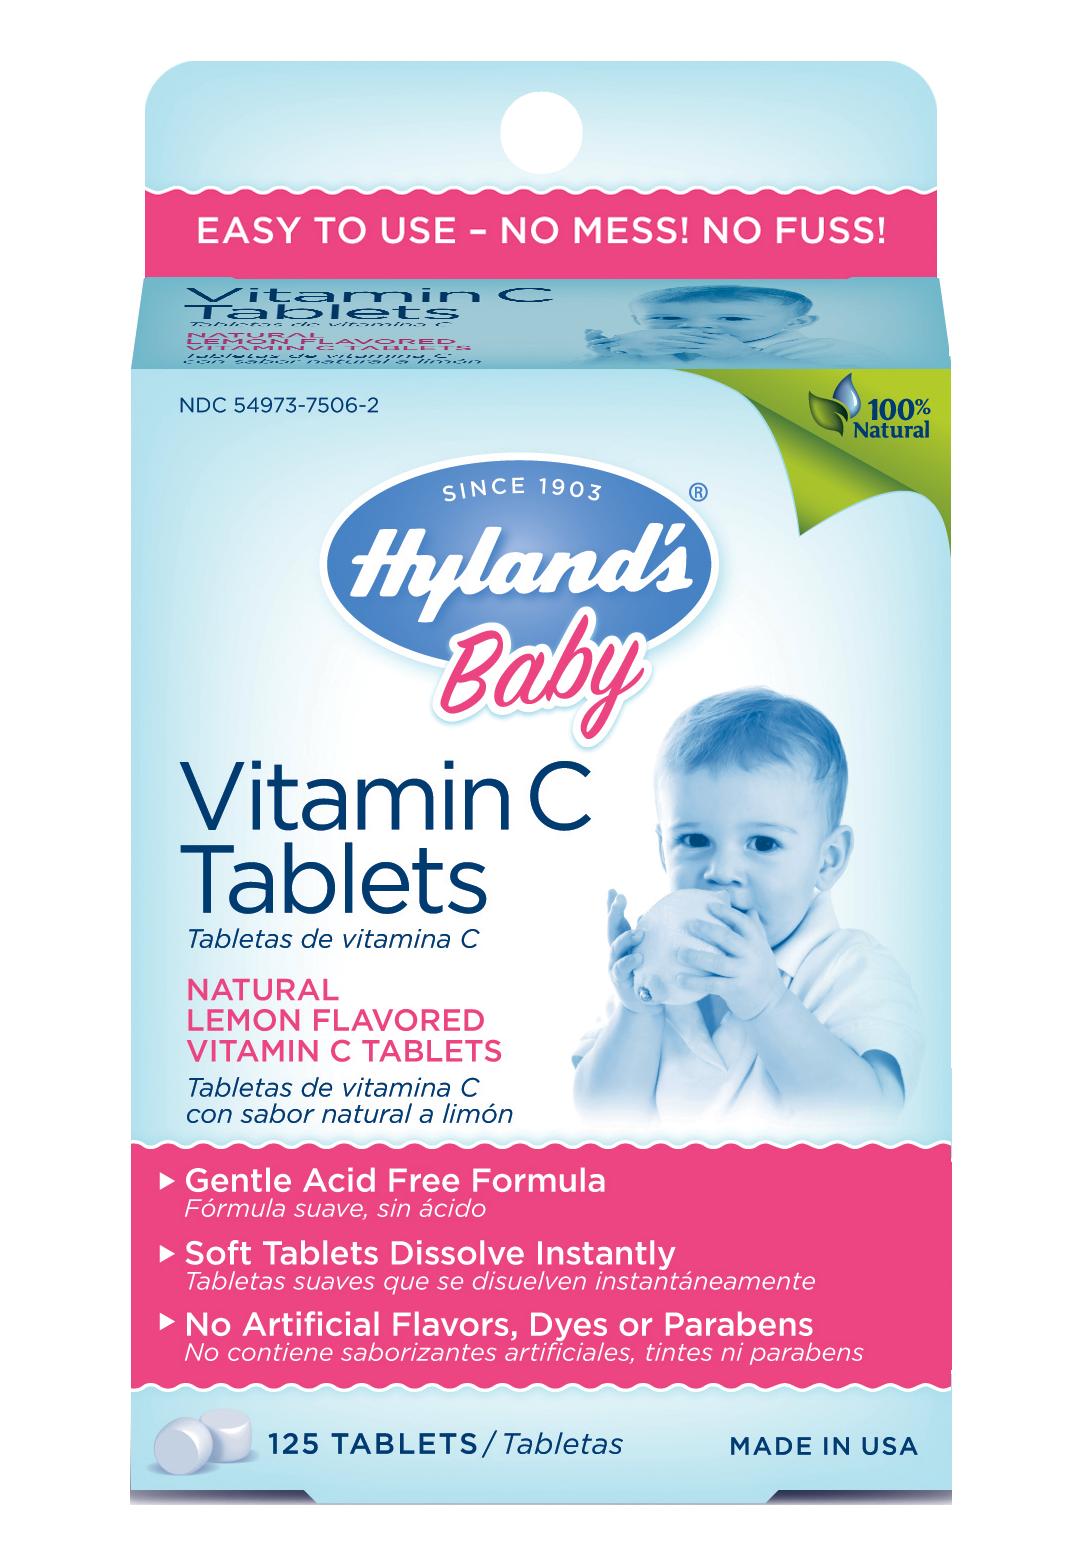 baby vitamin c tablets products baby vitamins vitamin c tablets rh pinterest co uk